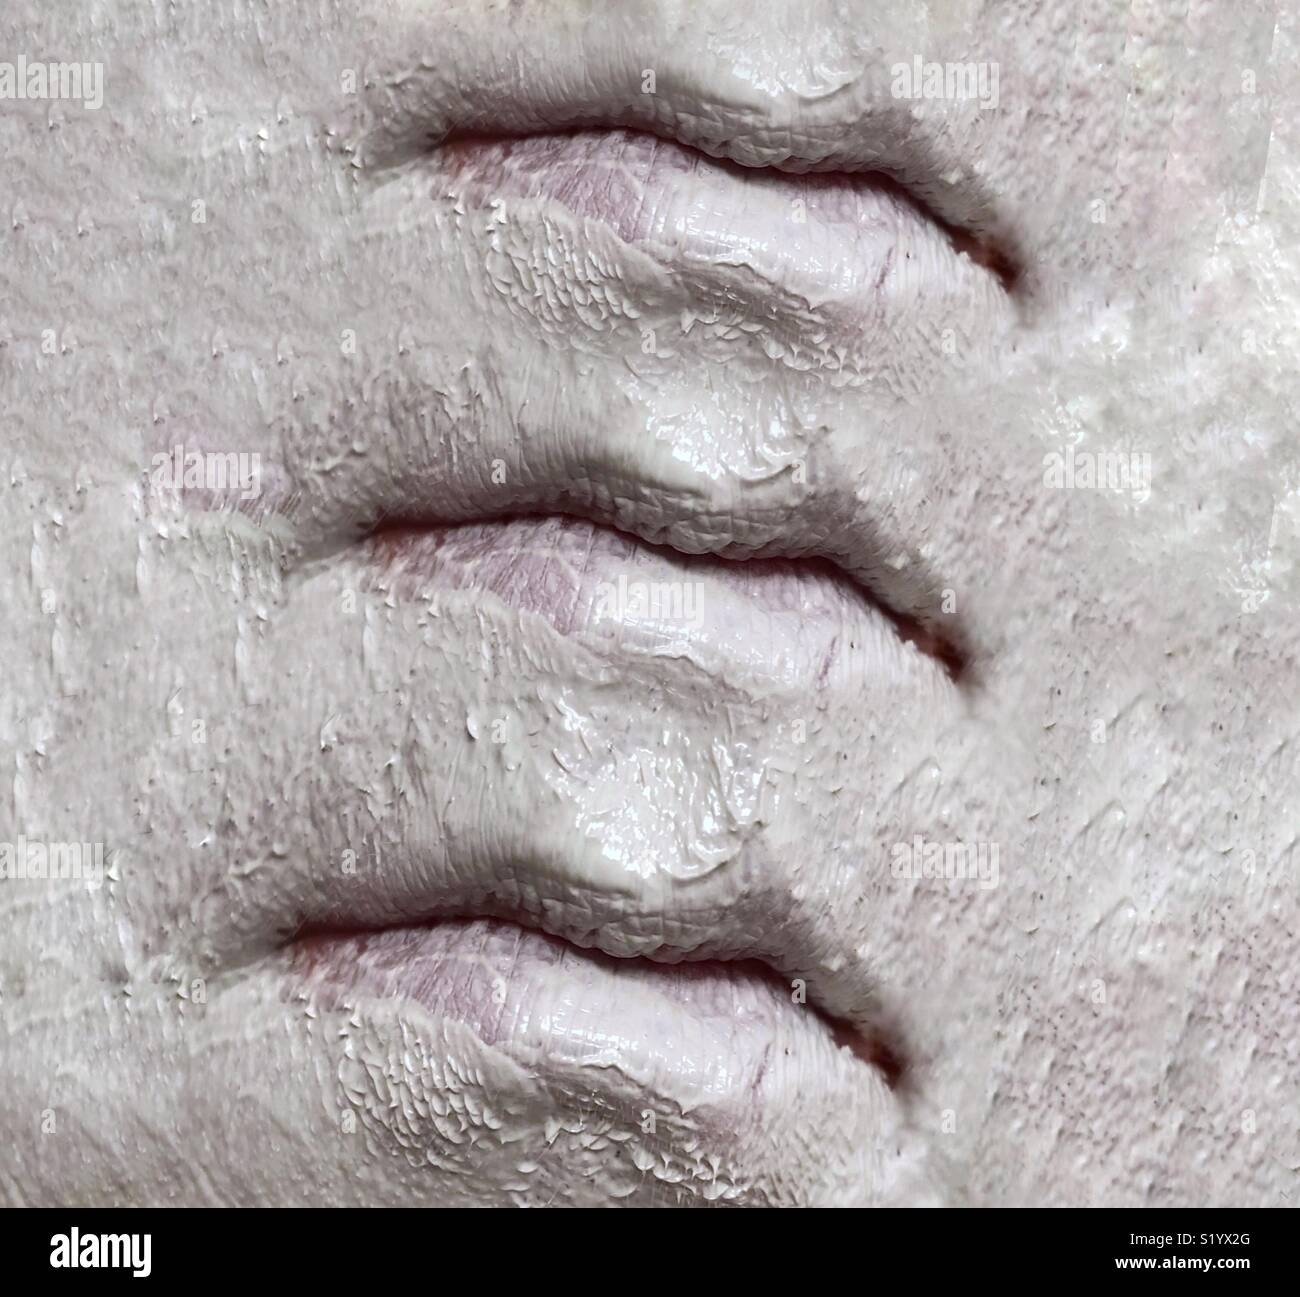 Un immagine astratta di tre set di labbra su una superficie rivestita di una argilla bianca maschera di fango Immagini Stock